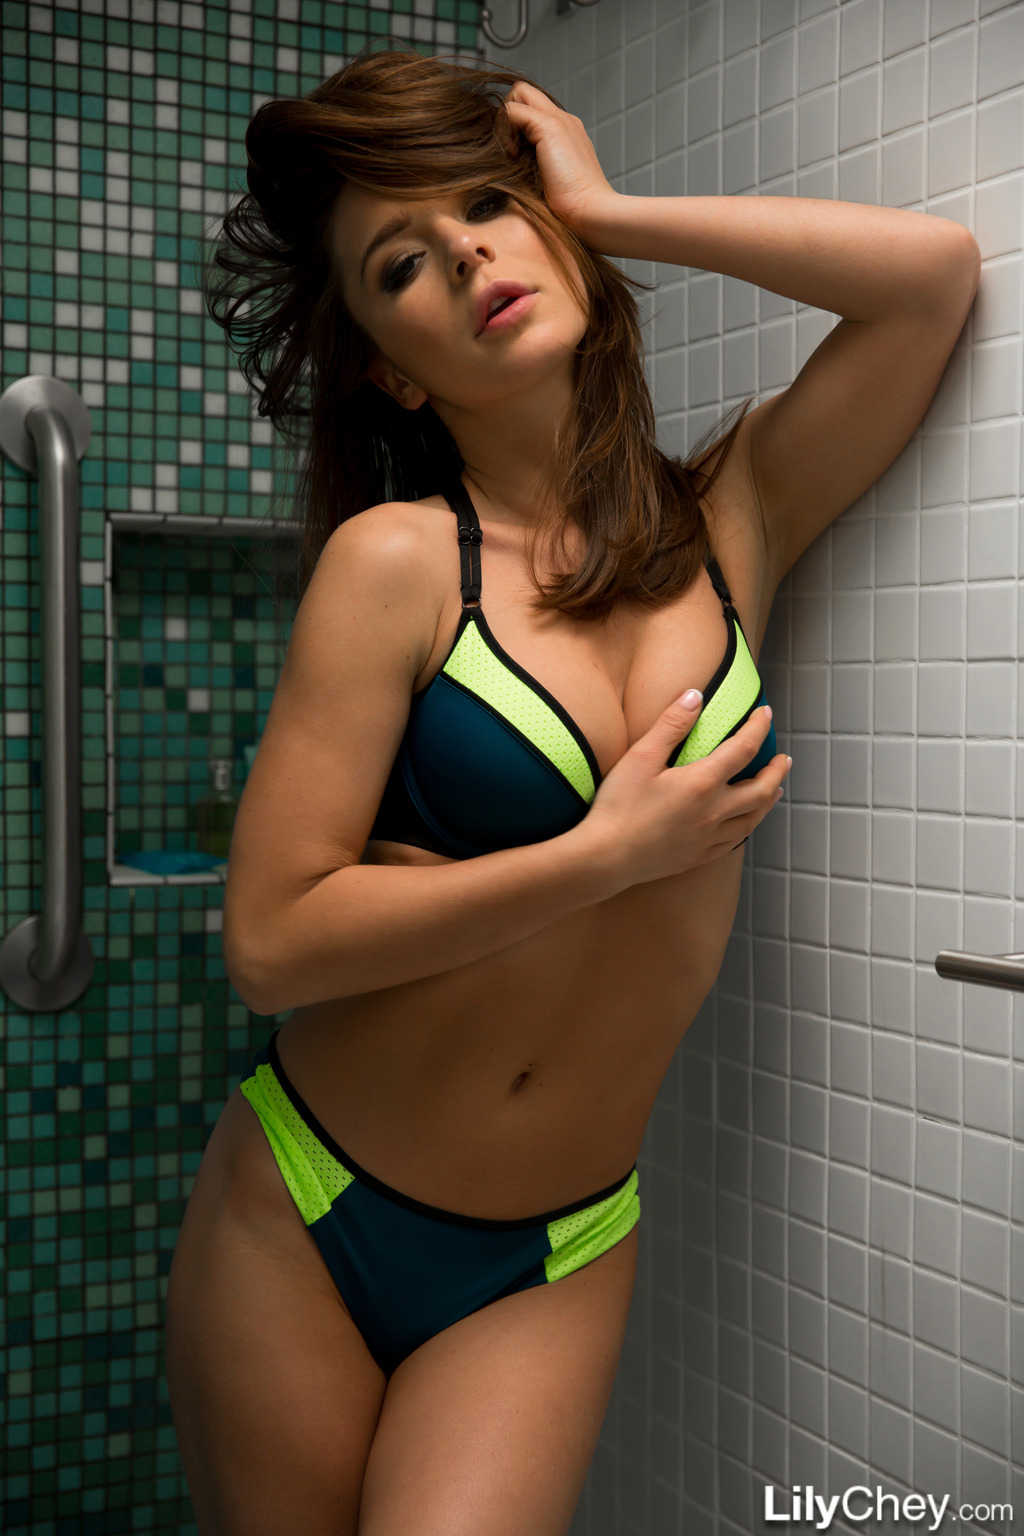 Lily Chey In Bikini Shower 10